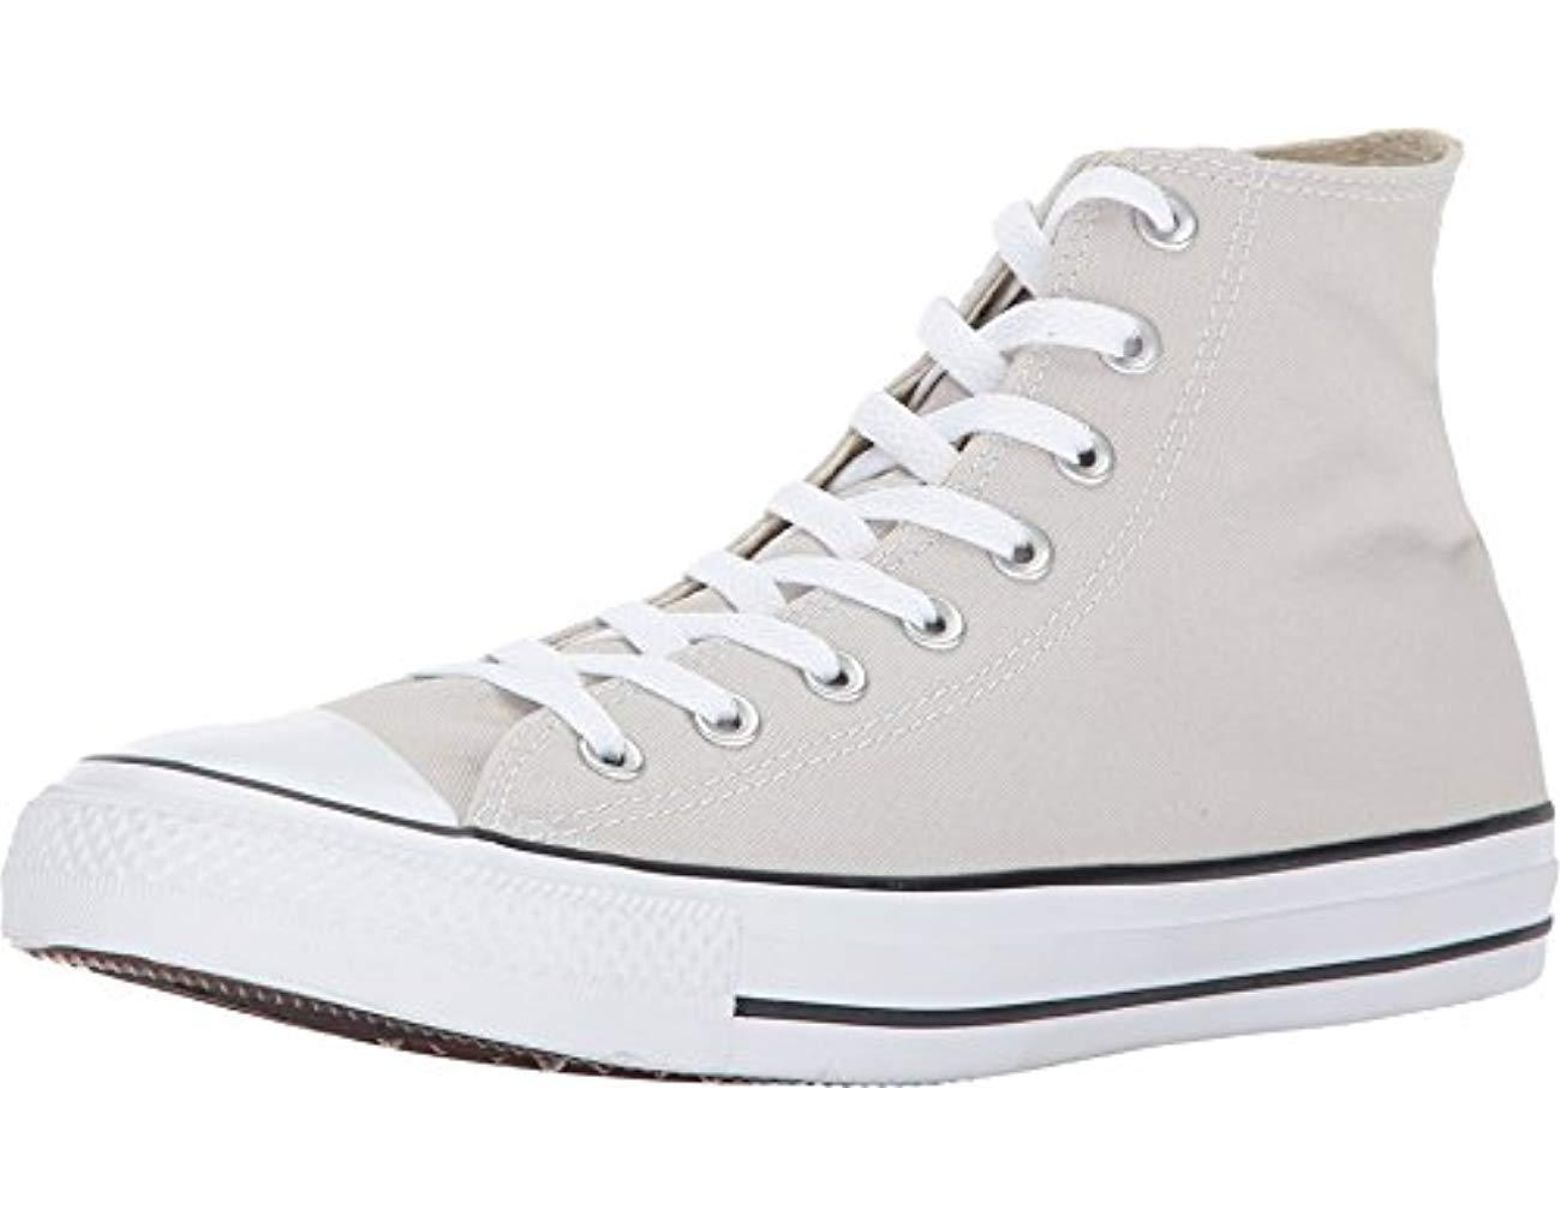 Men's White Chuck Taylor All Star High Top Sneaker